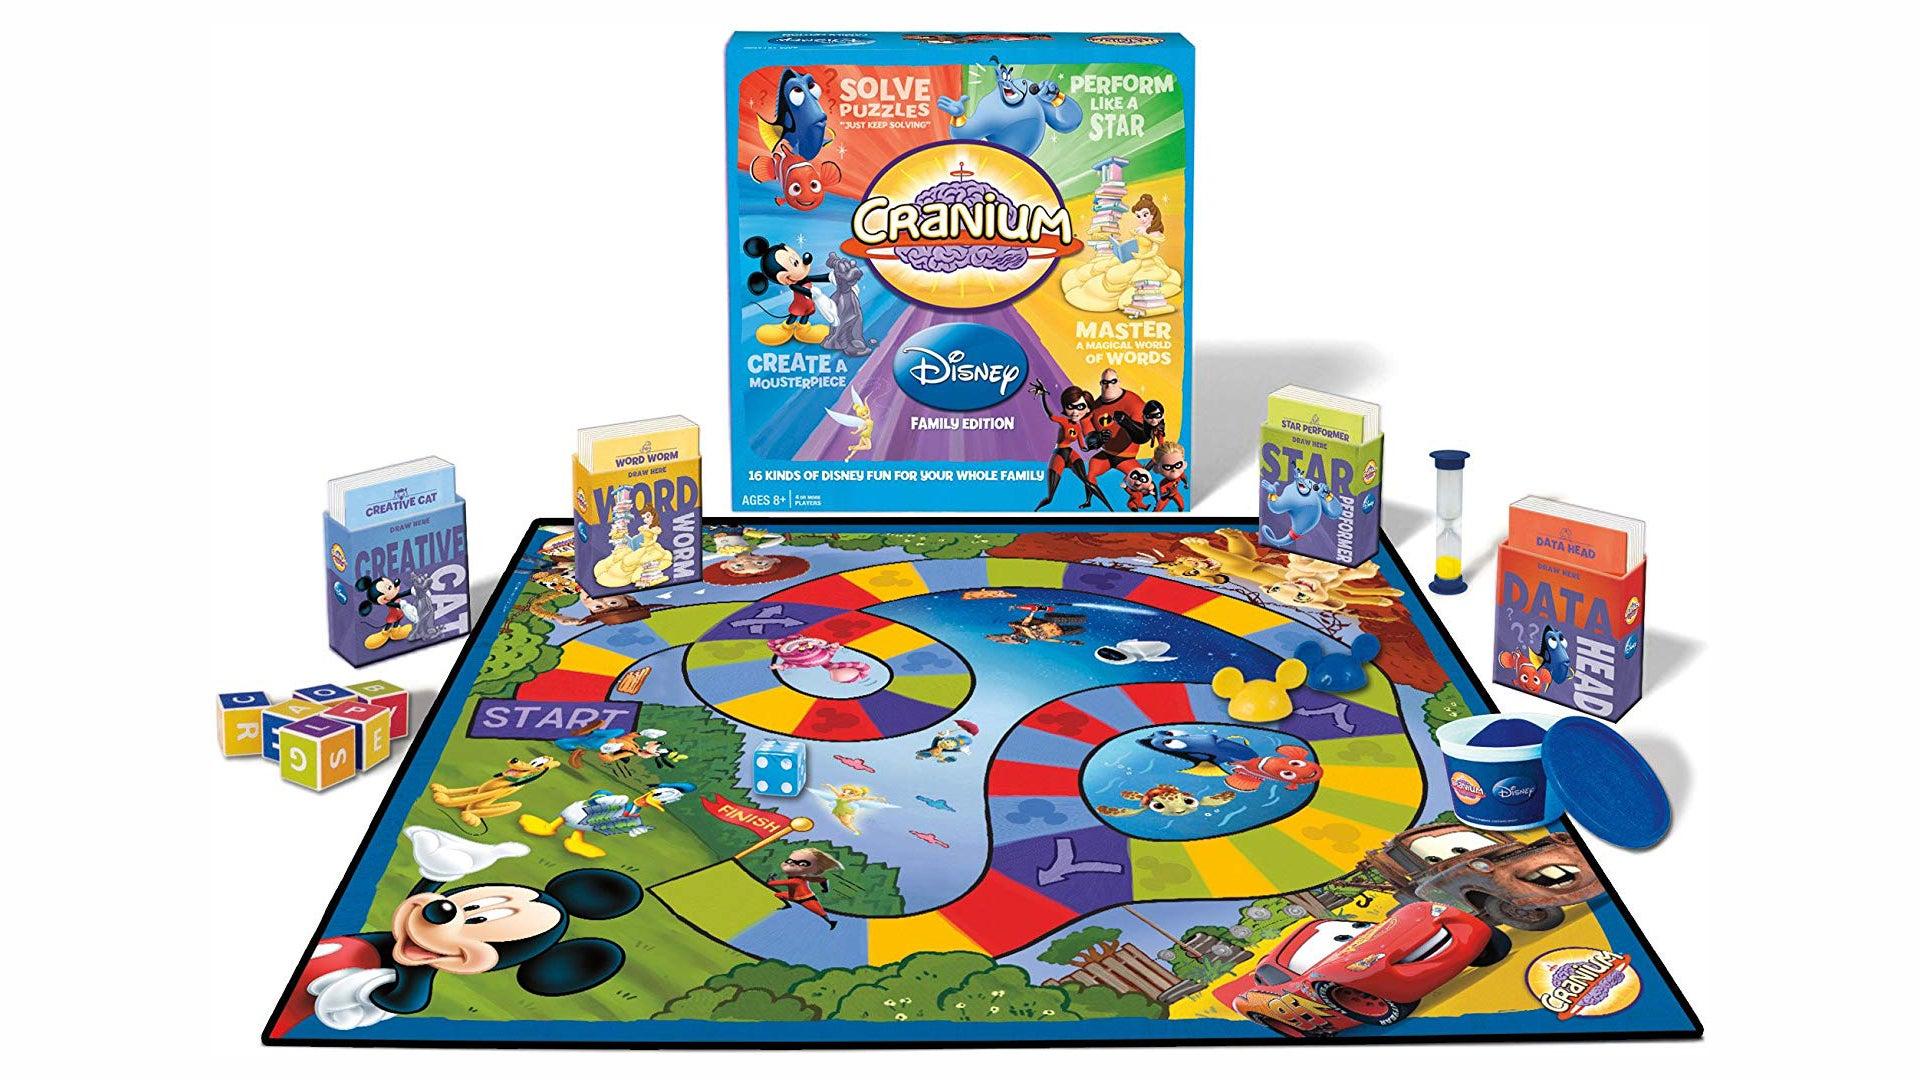 Cranium: Disney Family Edition board game layout